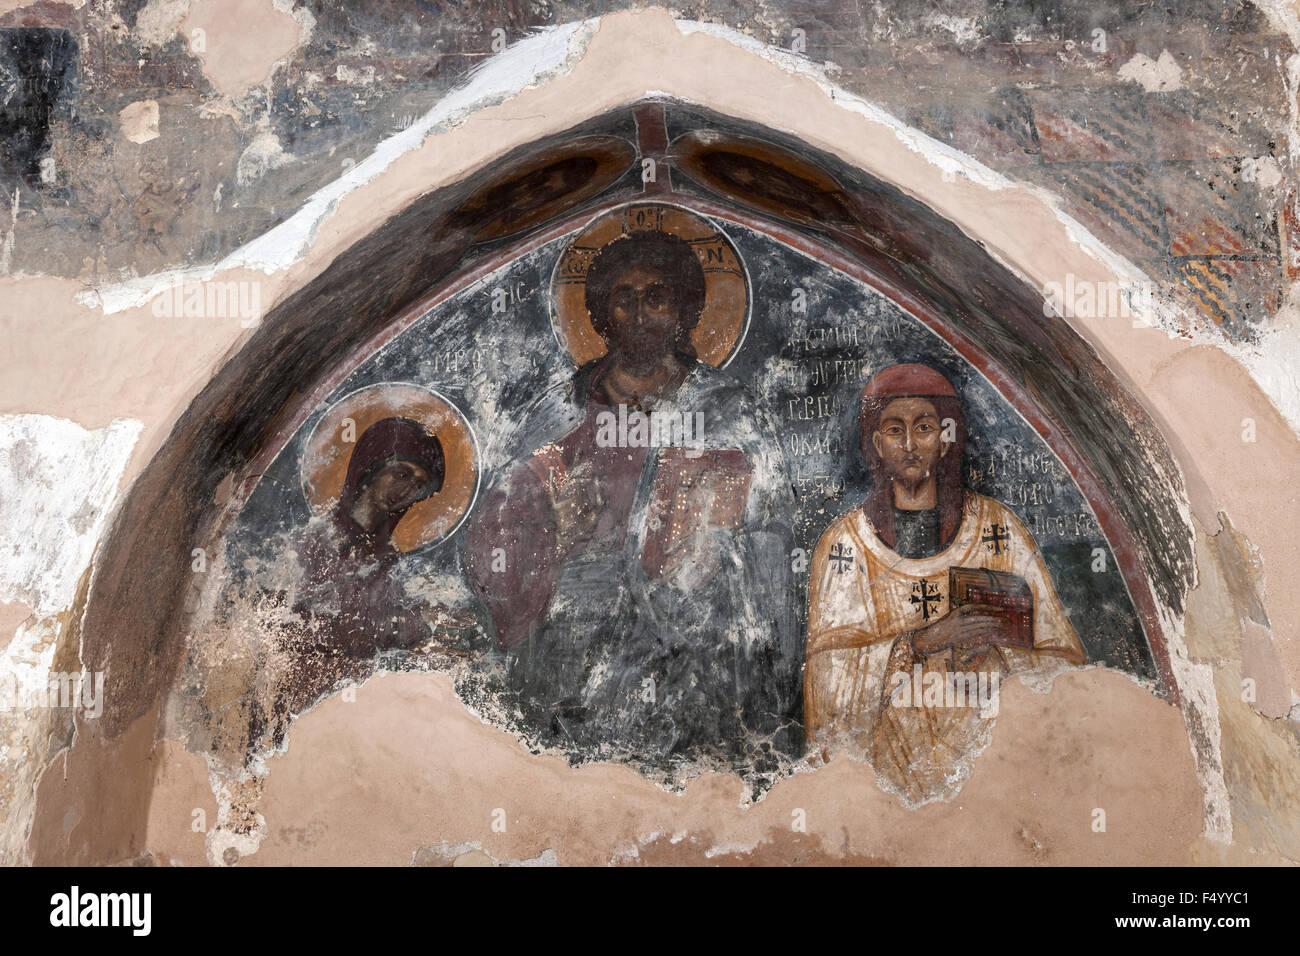 Greek Orthodox iconography. - Stock Image